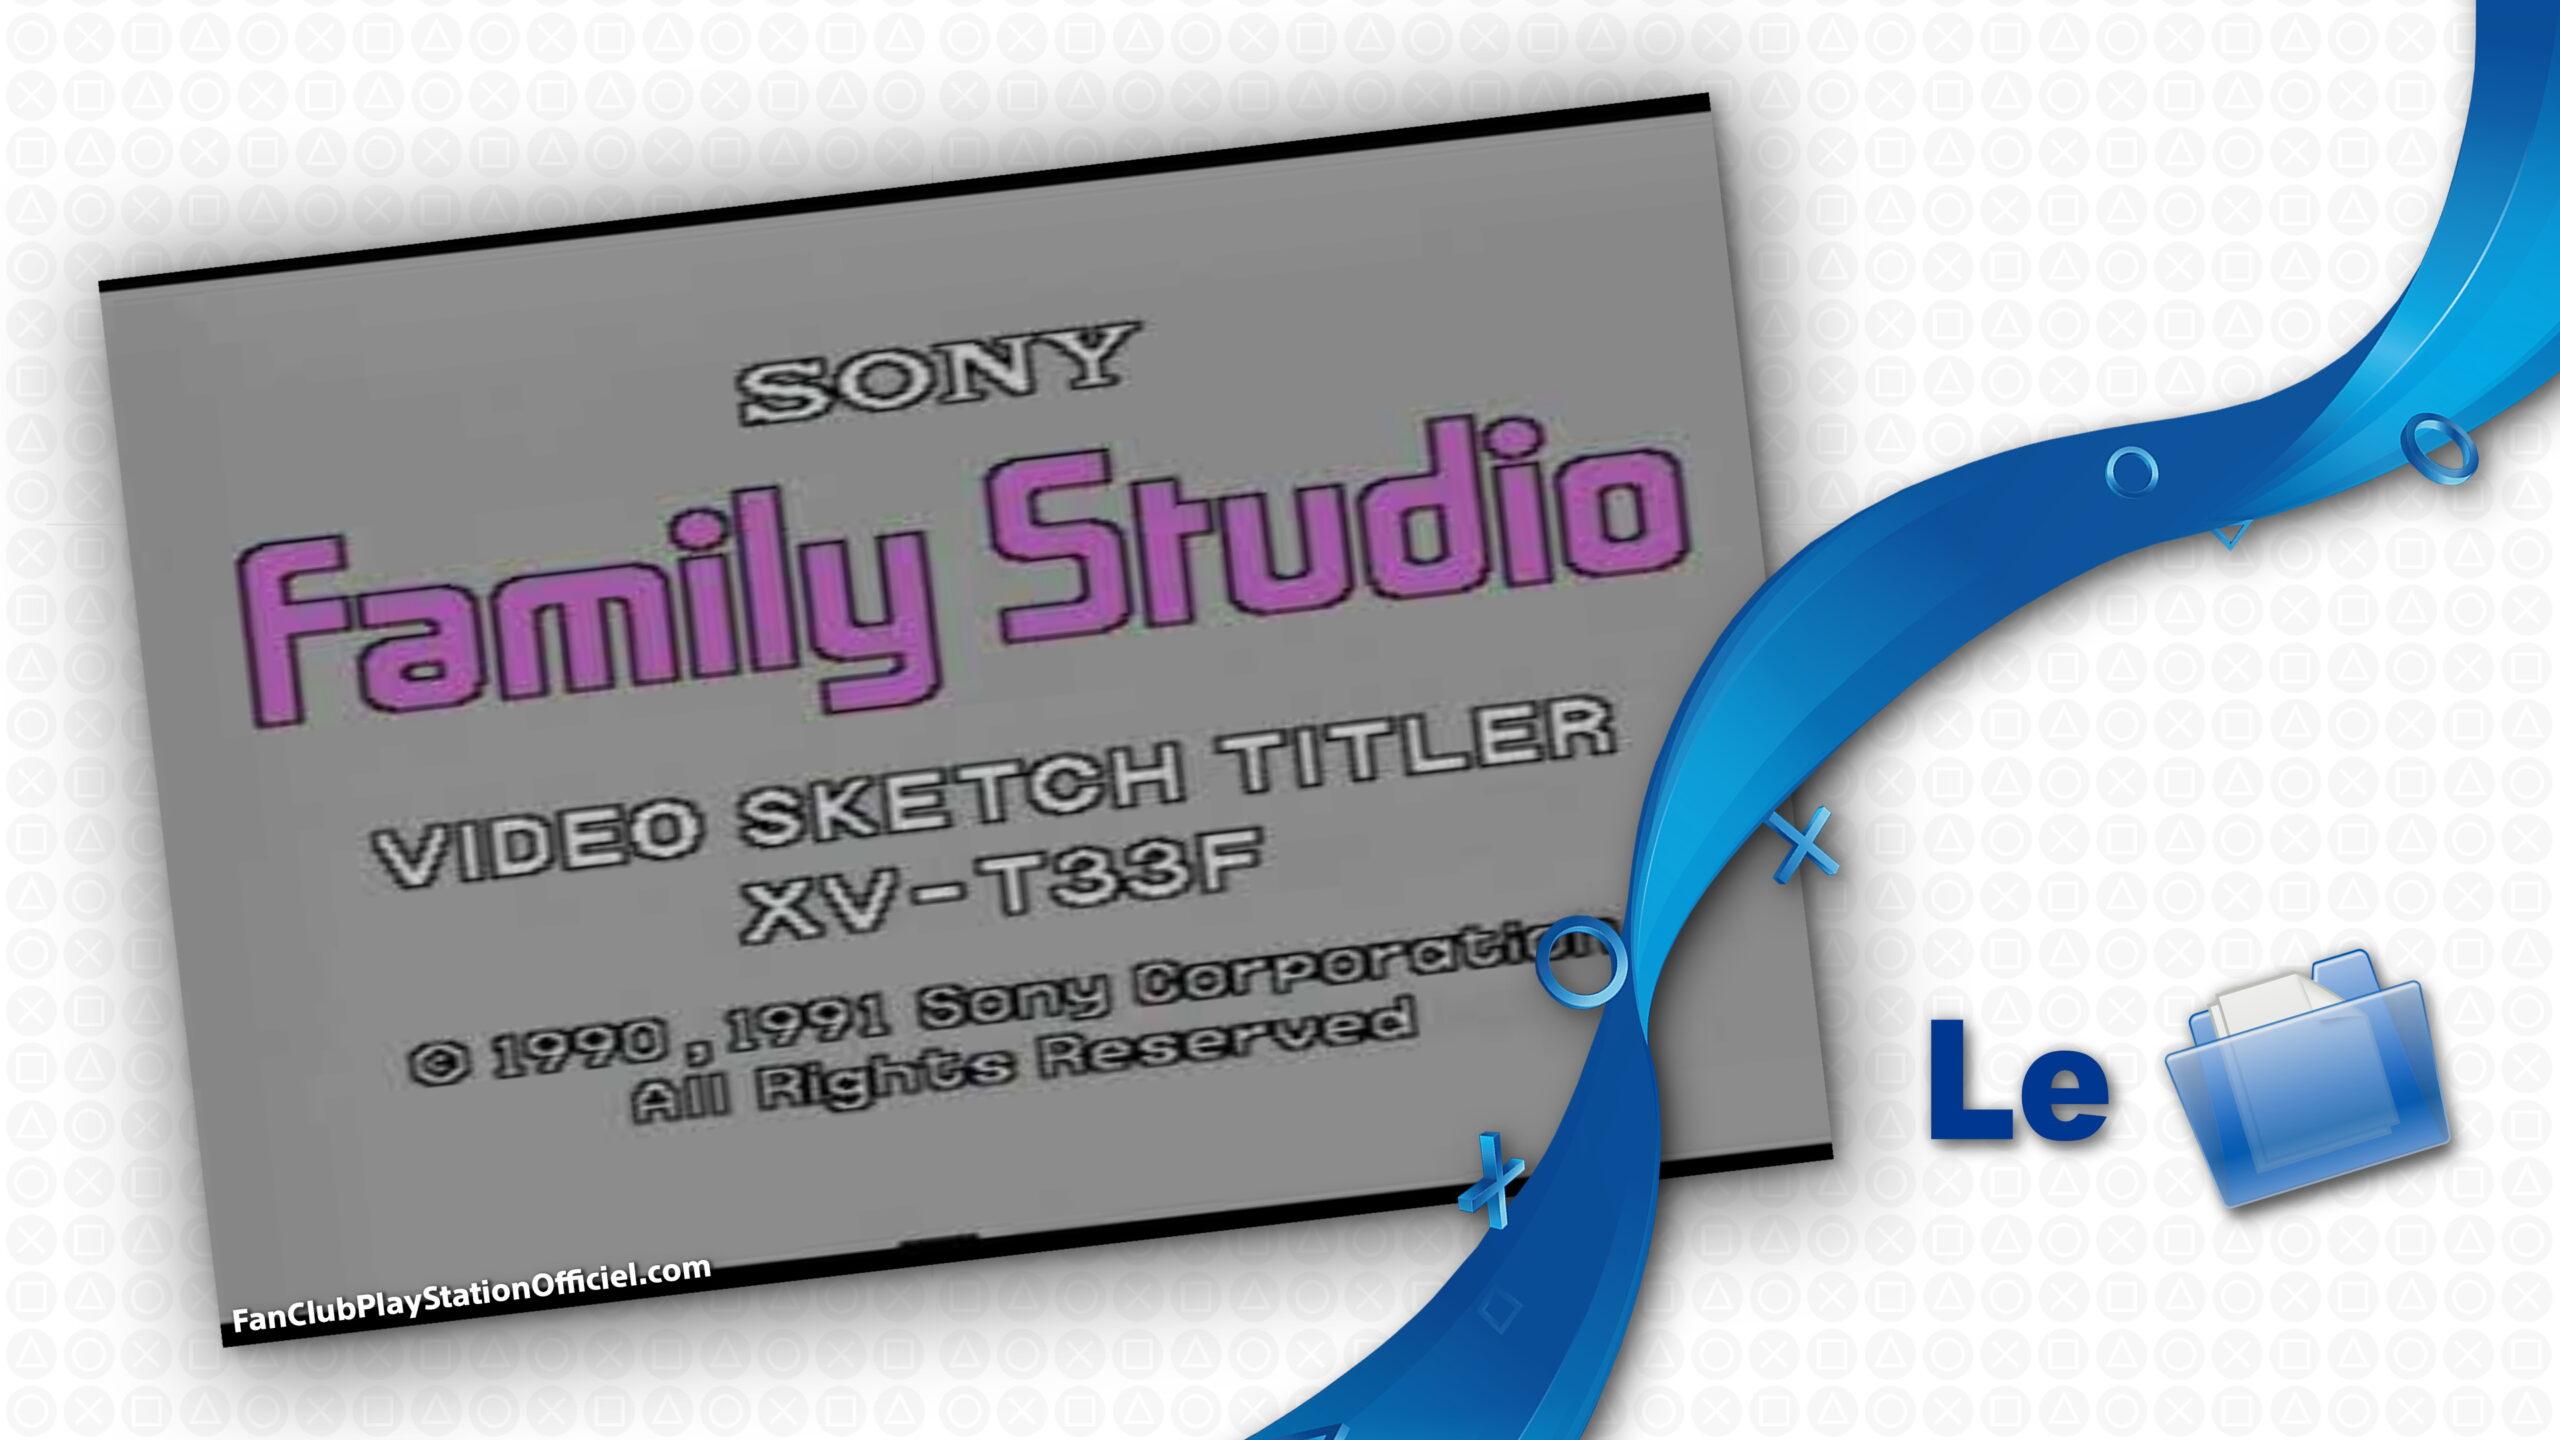 Sony XV-T33F Titreur Family Studio